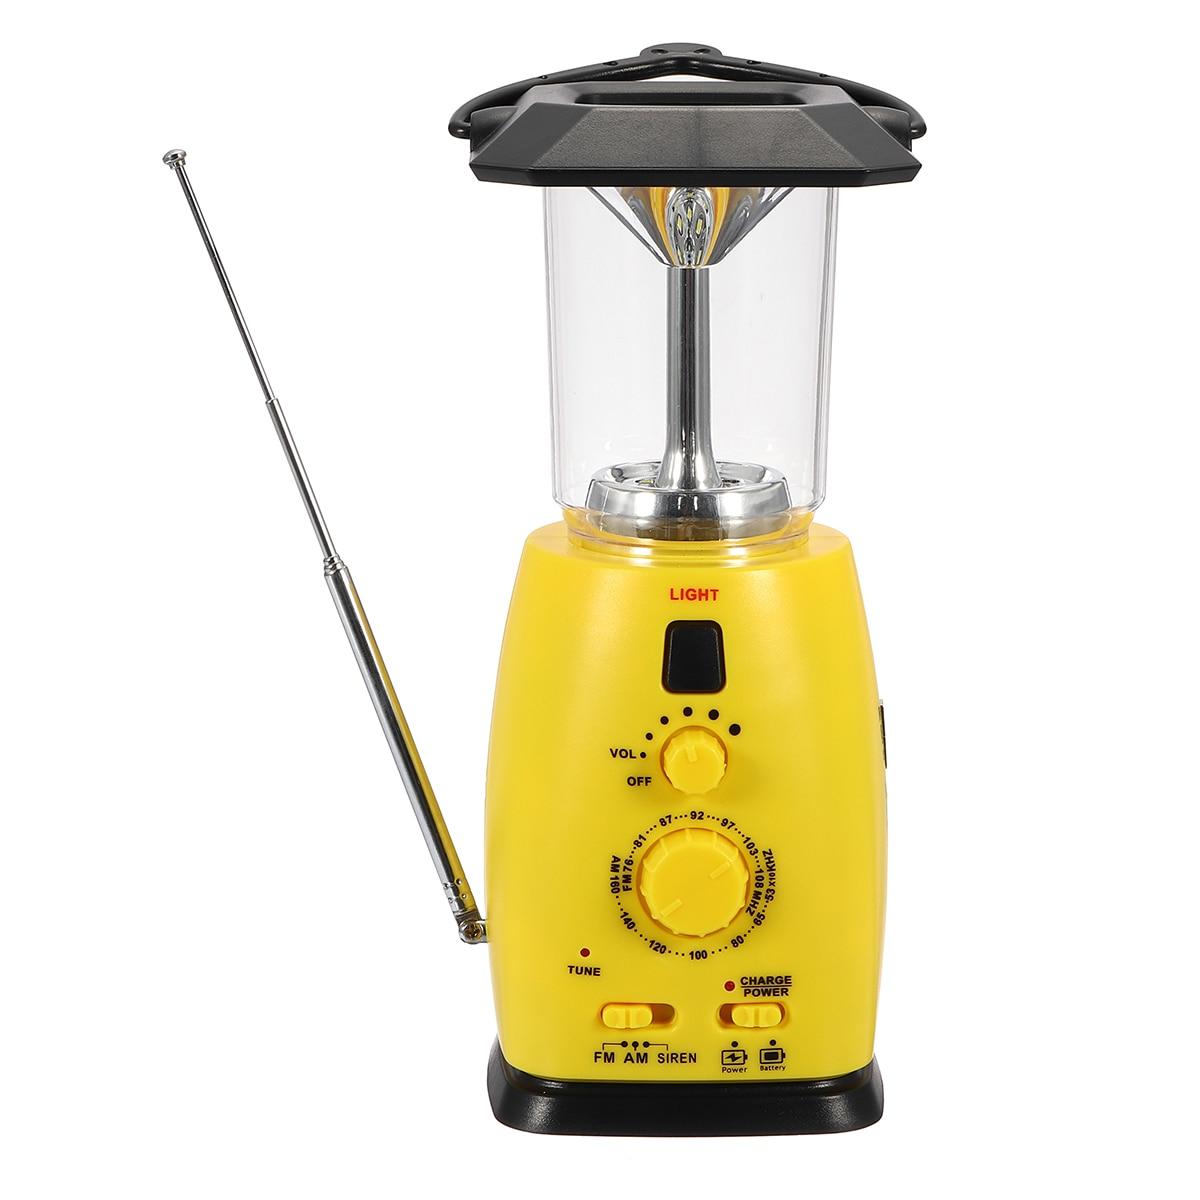 Hand Crank Emergency Light Portable Crank Solar 8 LED Camping Flashlight Radio Digital Mobile Phone Charging Solar Outdoor Lamp